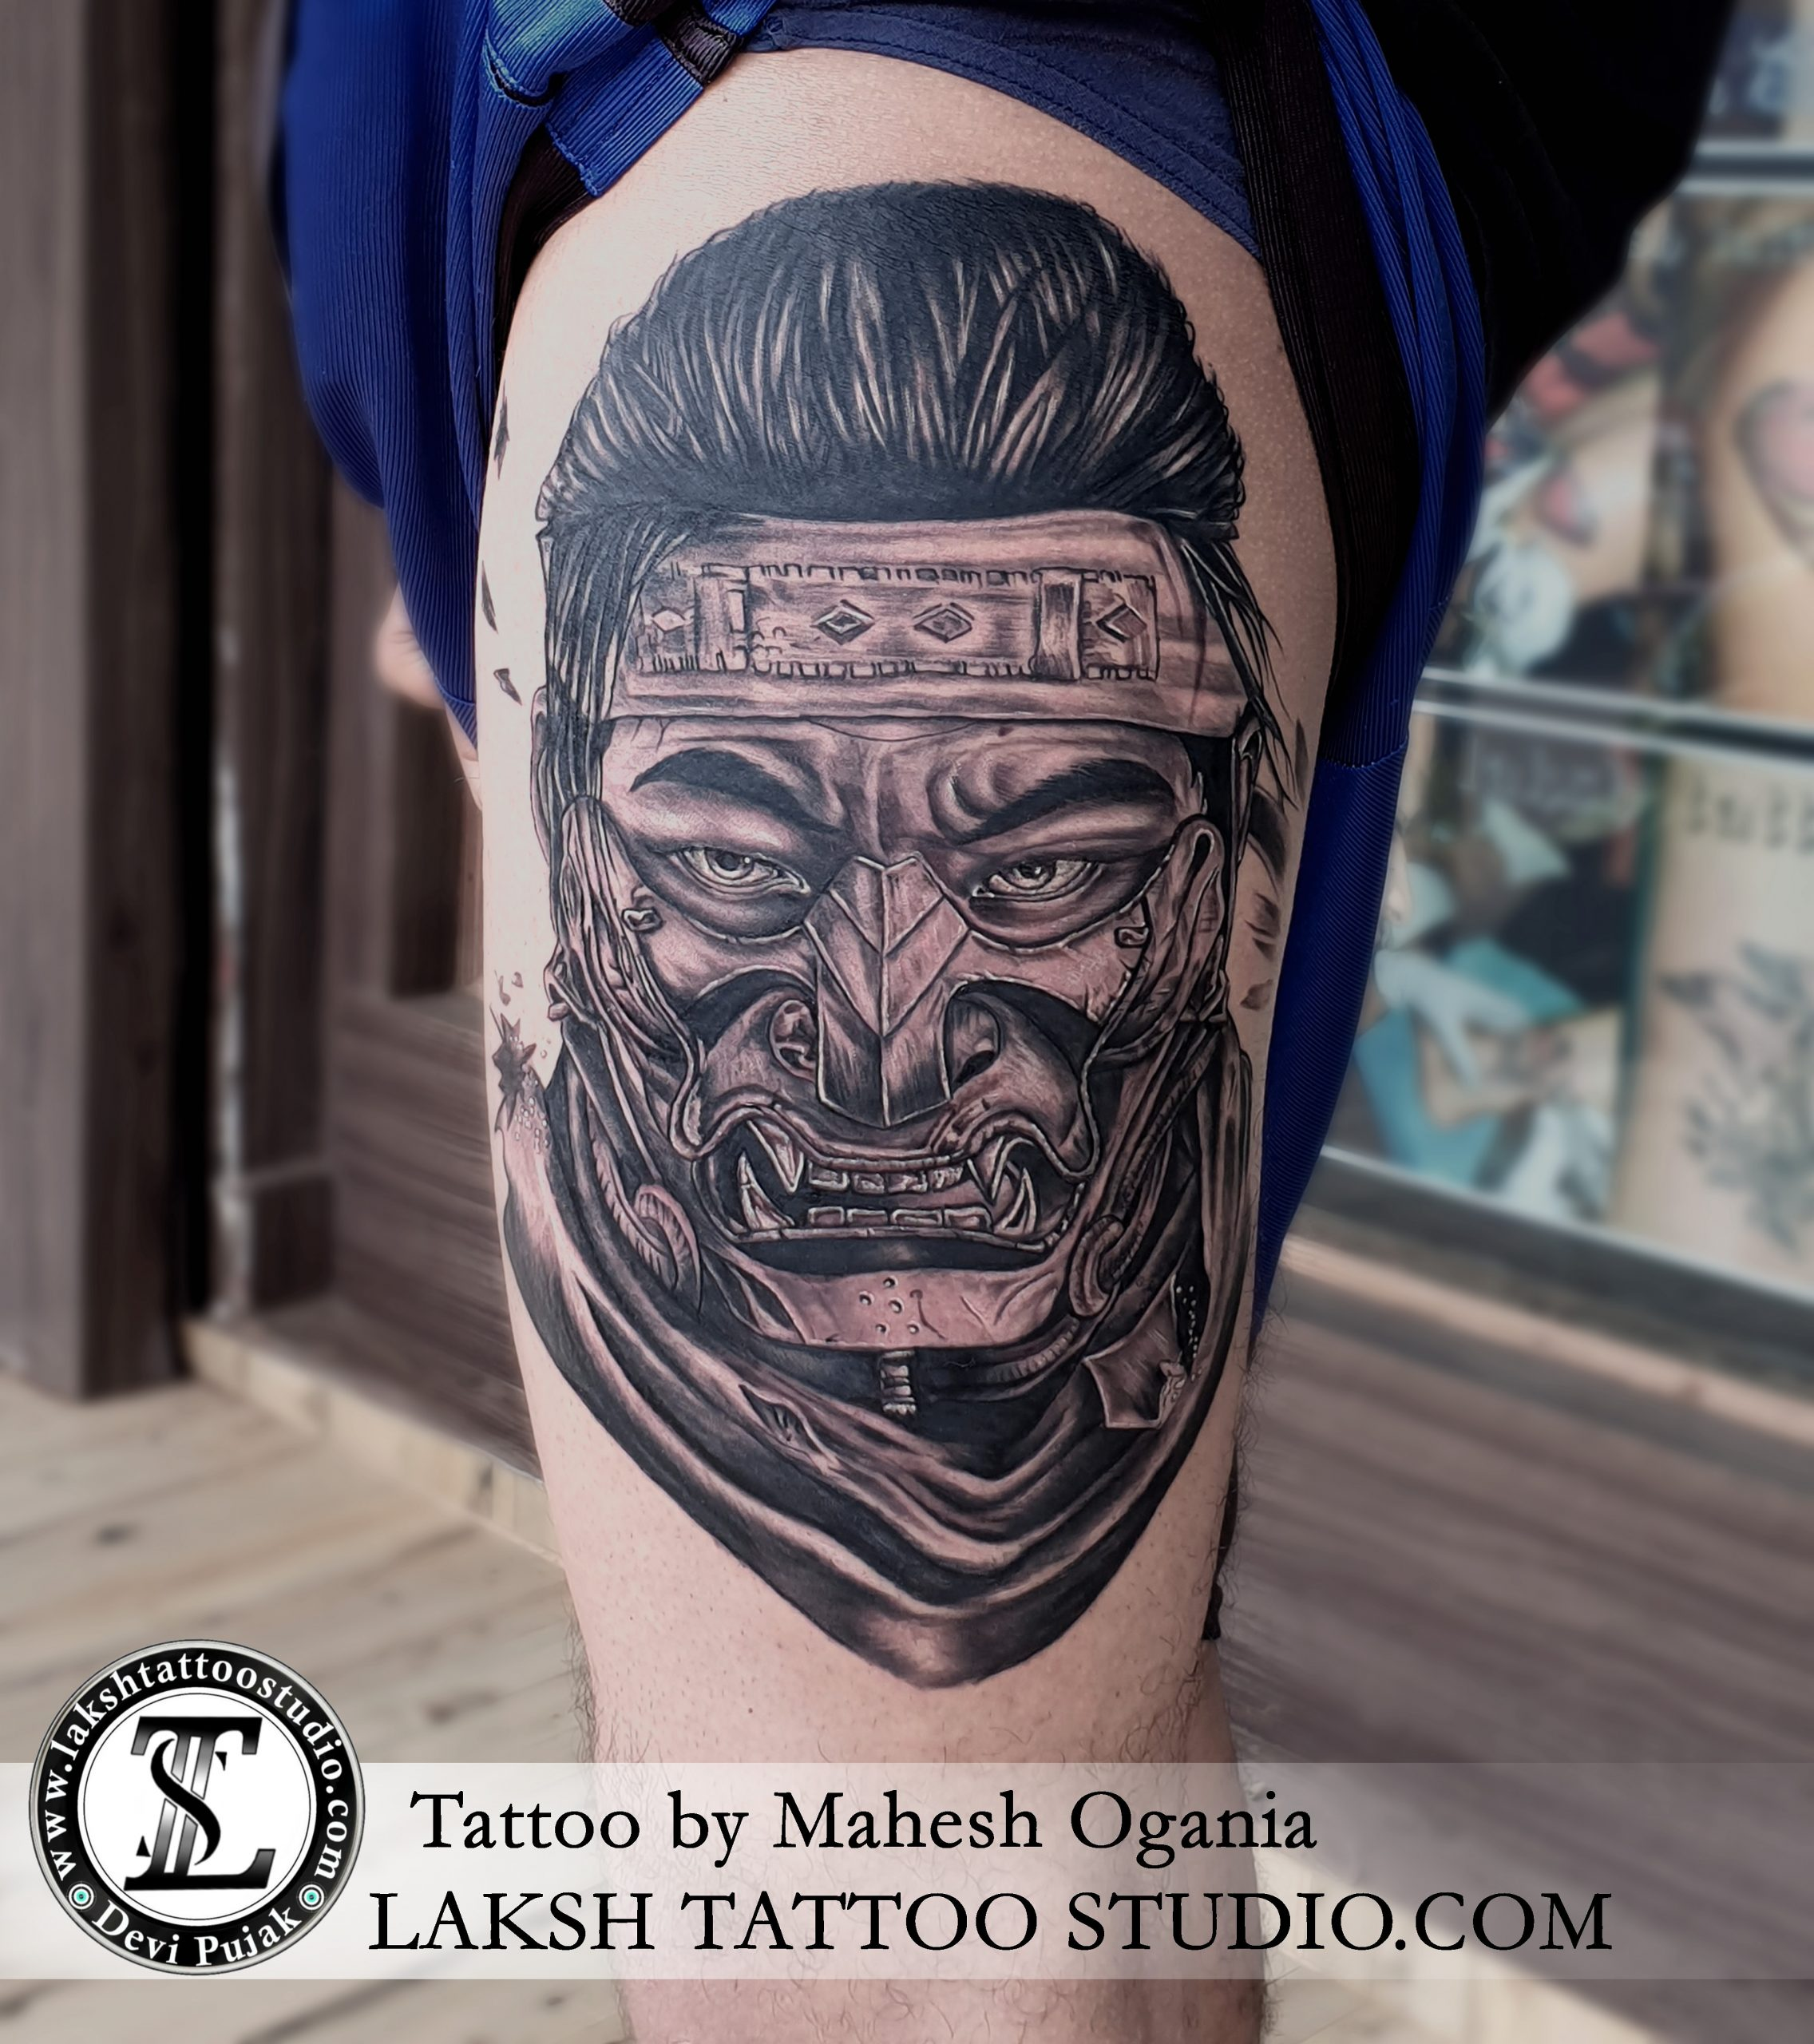 Samurai Portrait Tattoo by Mahesh Ogania